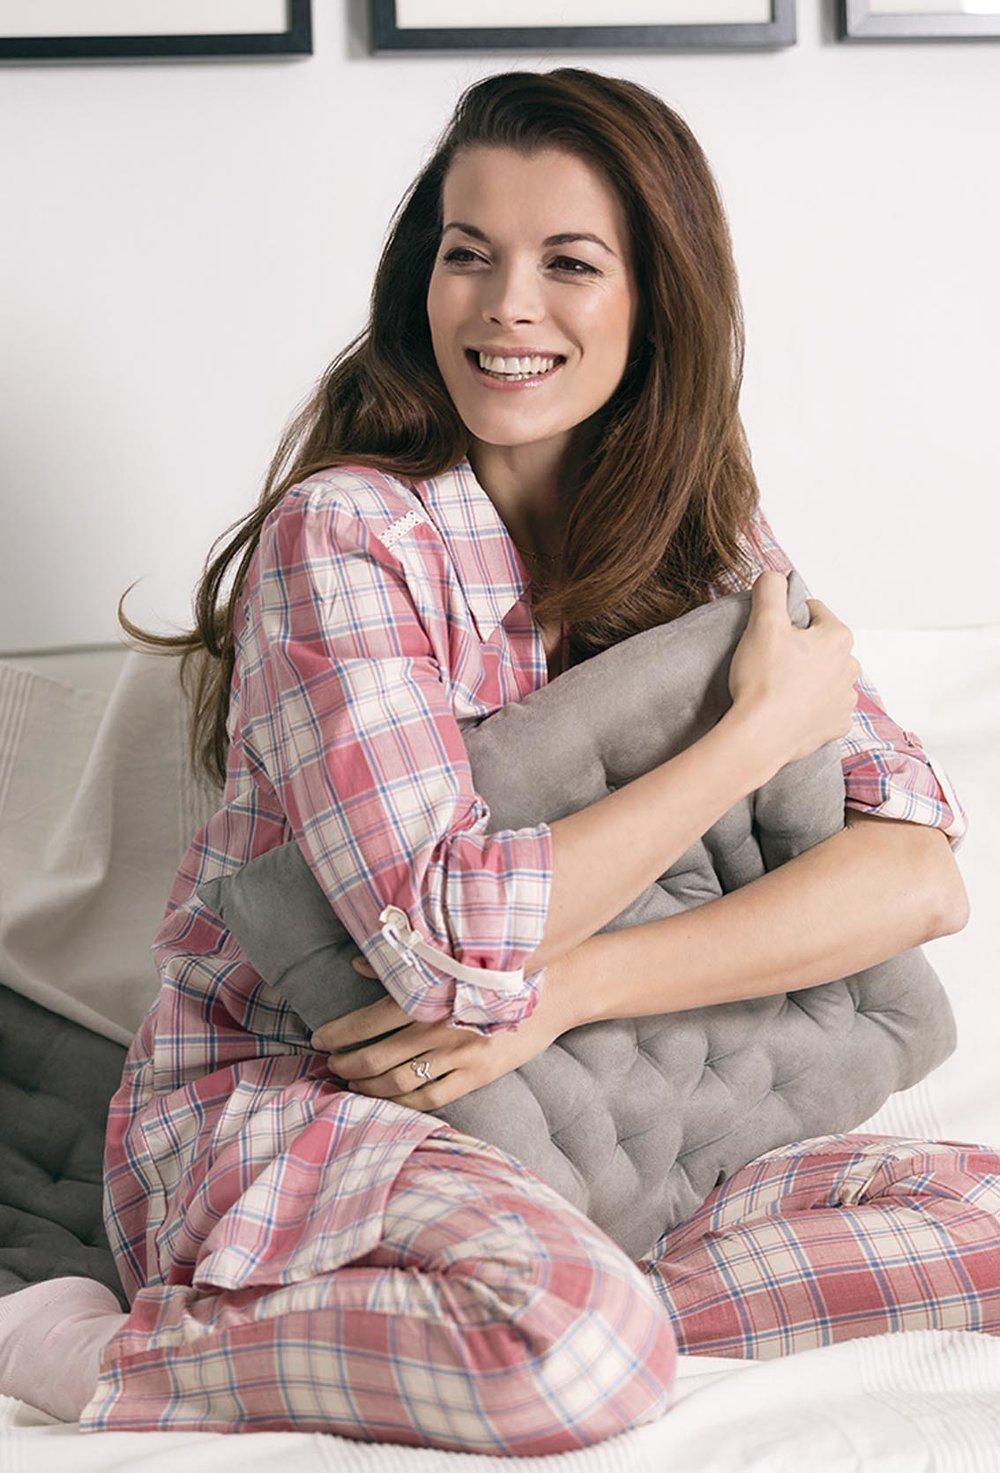 Girogia im Pyjama lächelt